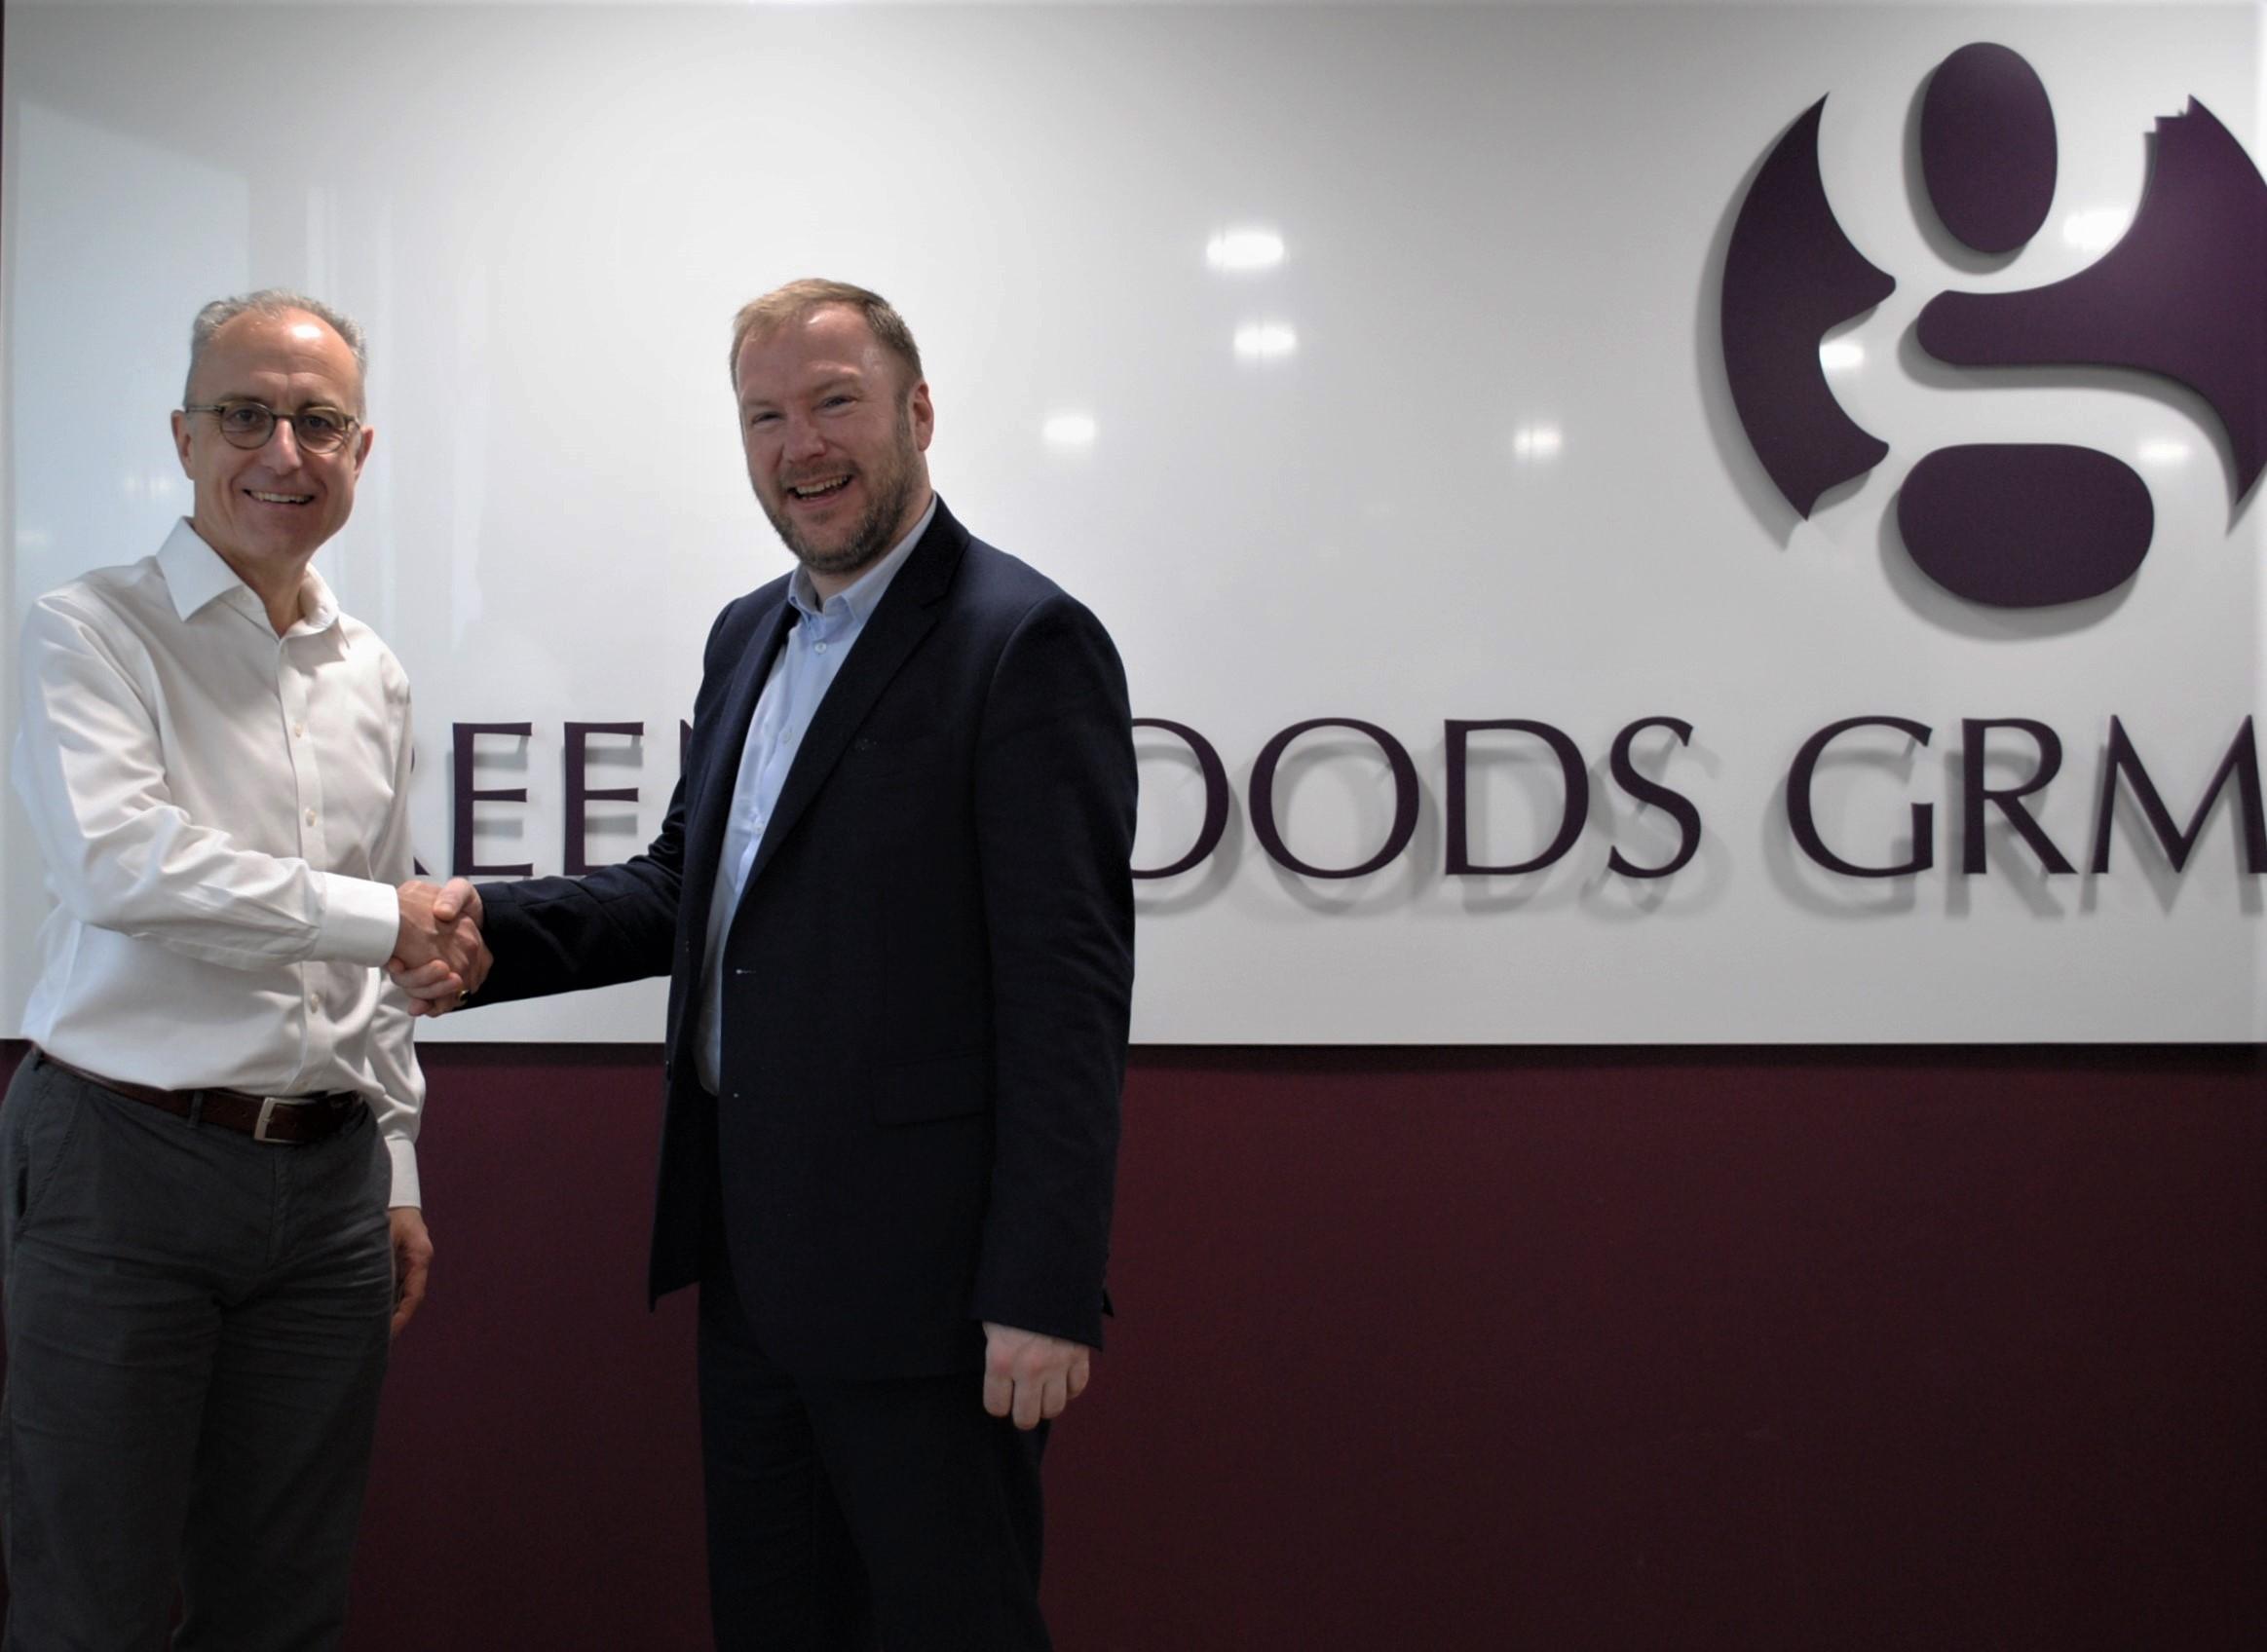 Gareth Hughes joins Greenwoods GRM LLP